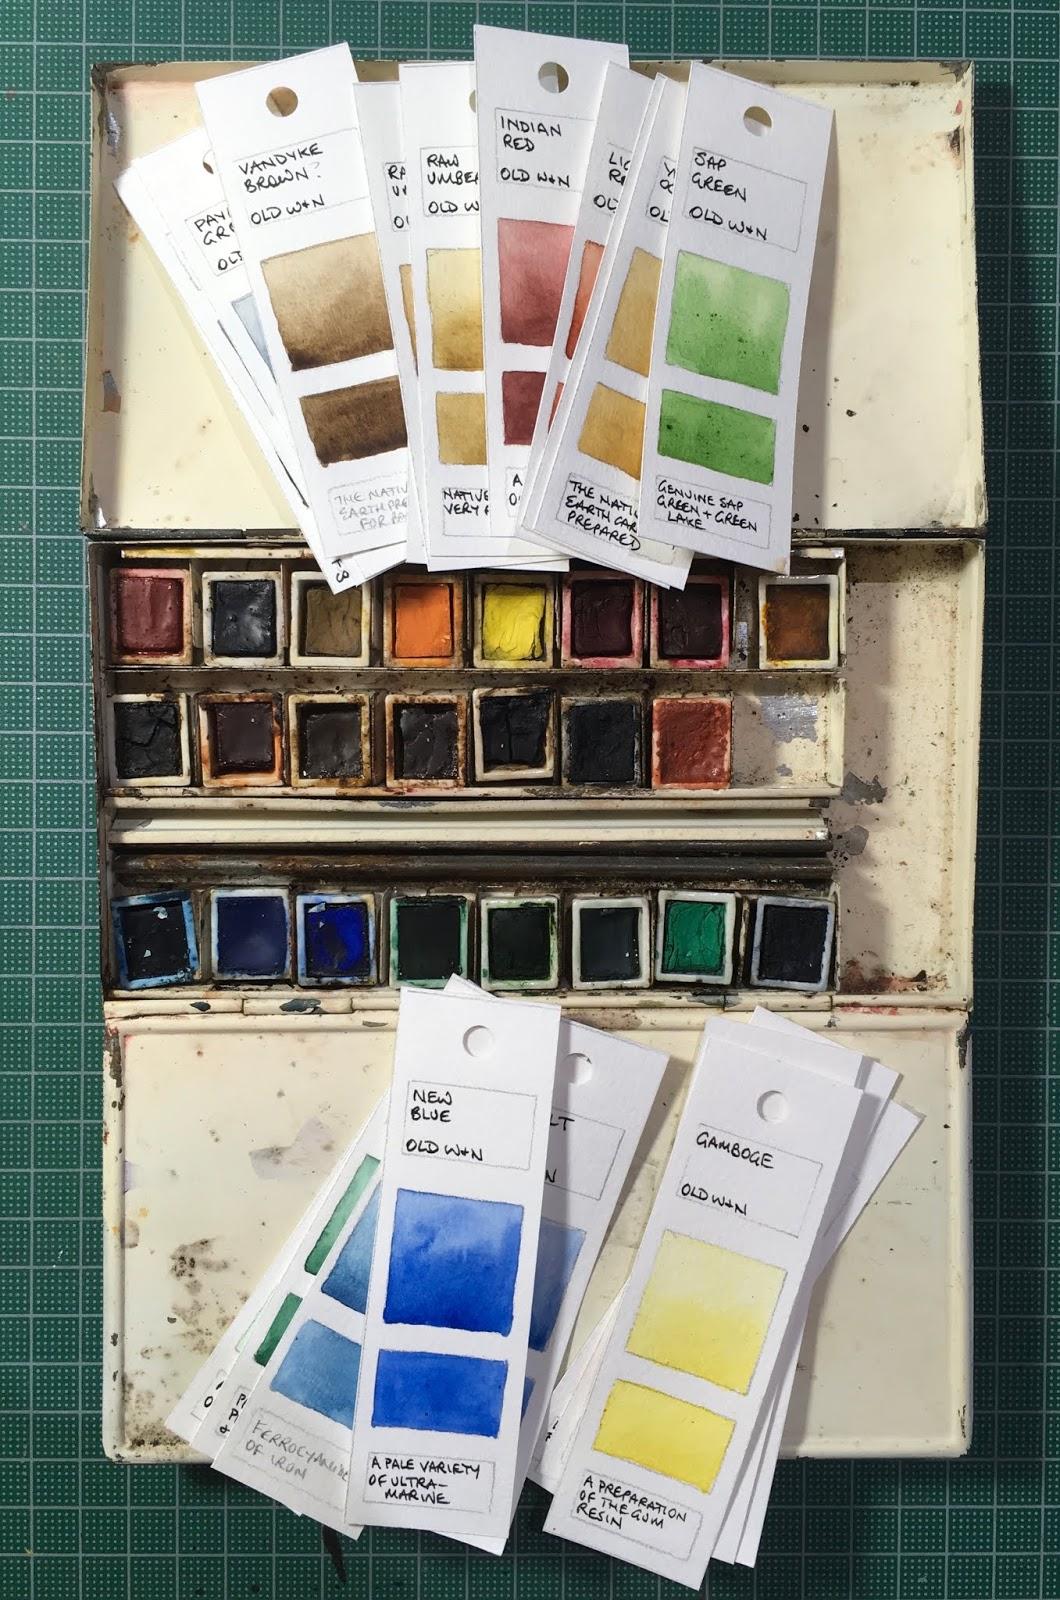 Winsor And Newton Watercolor Palette : winsor, newton, watercolor, palette, Blundell, Artist:, Antique, Winsor, Newton, Paint